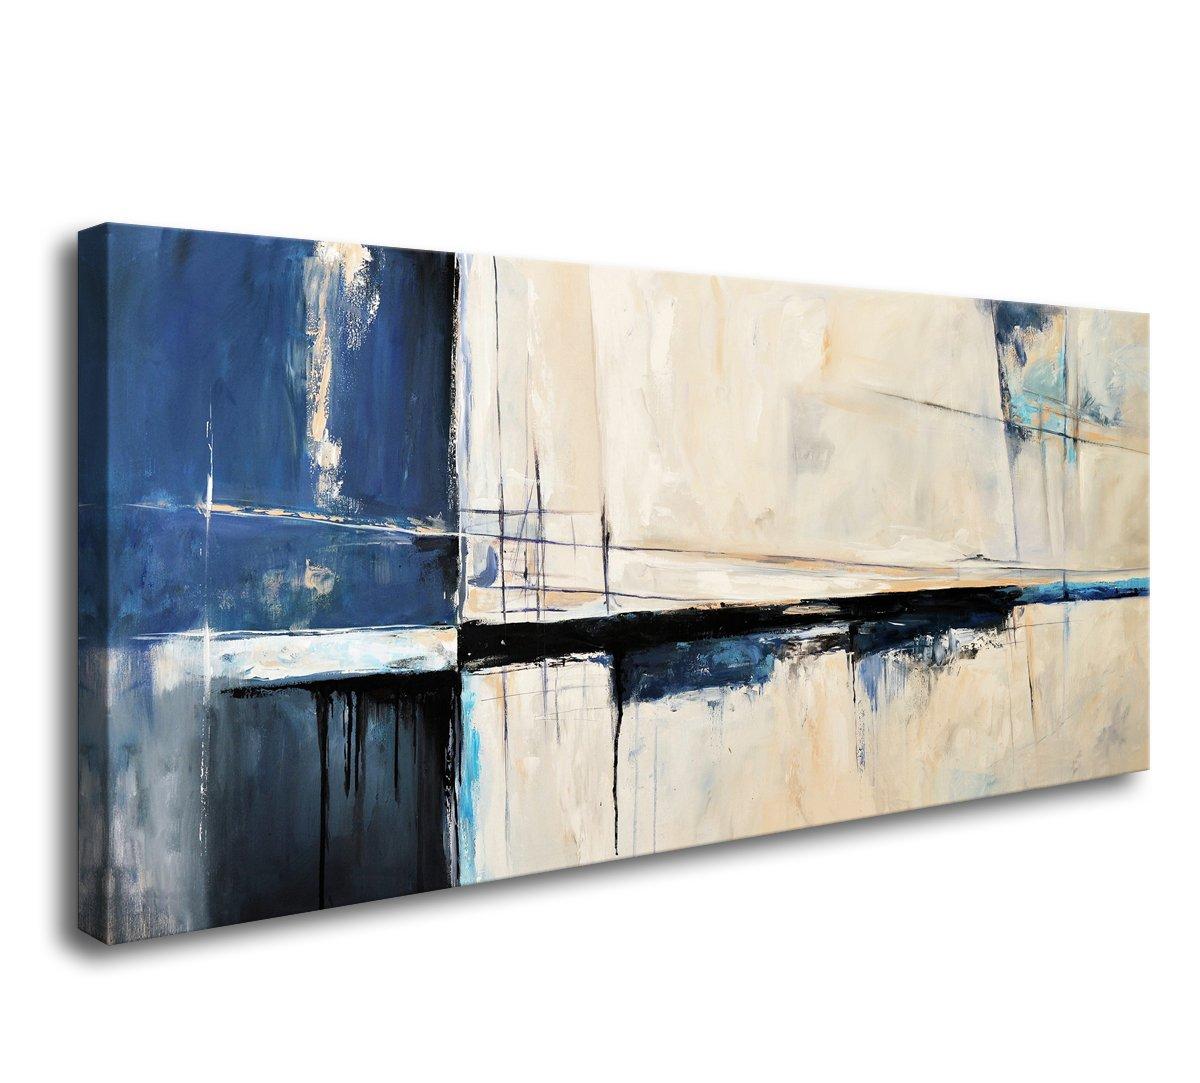 Cao Gen Decor Art A10 Wall Art Framed Canvas Prints Abstract ...